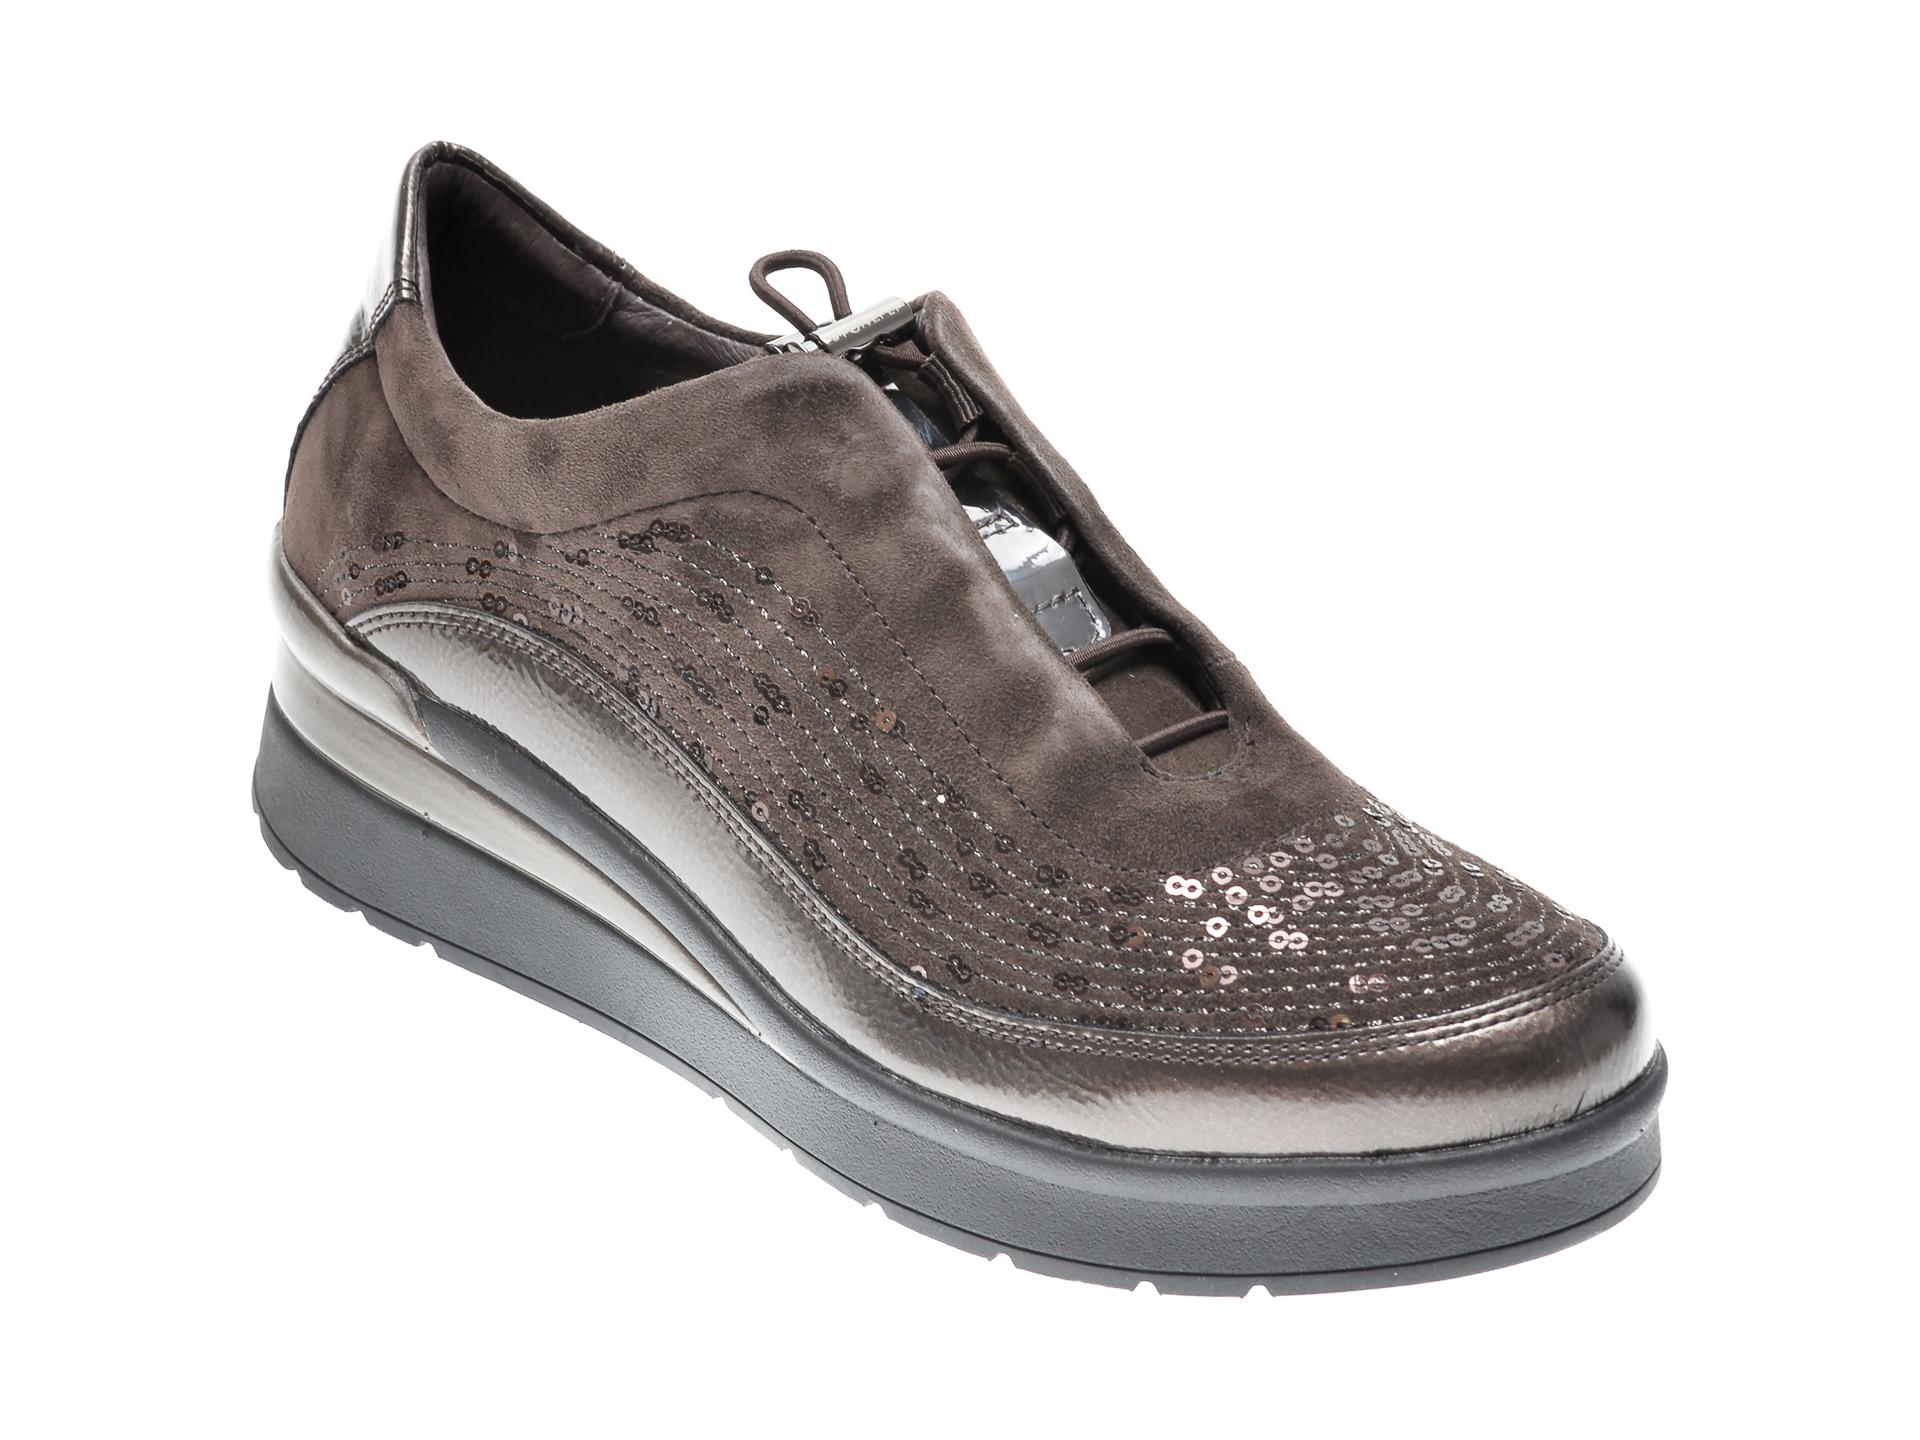 Pantofi STONEFLY maro, CREAM21, din piele intoarsa imagine otter.ro 2021